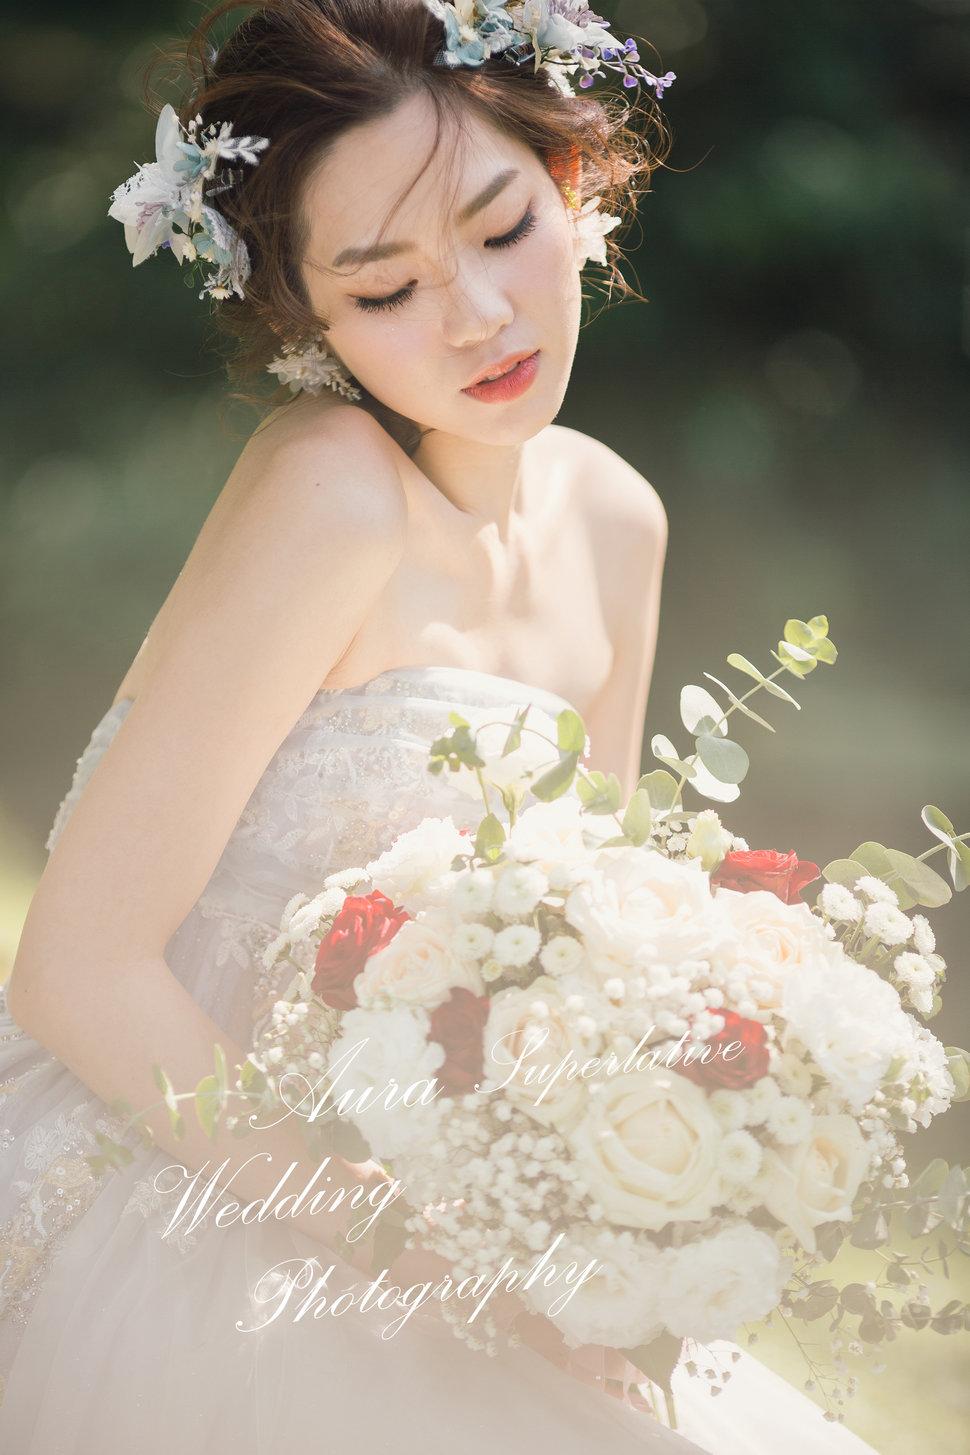 _U_S4051 - 奧拉最上婚紗攝影《結婚吧》